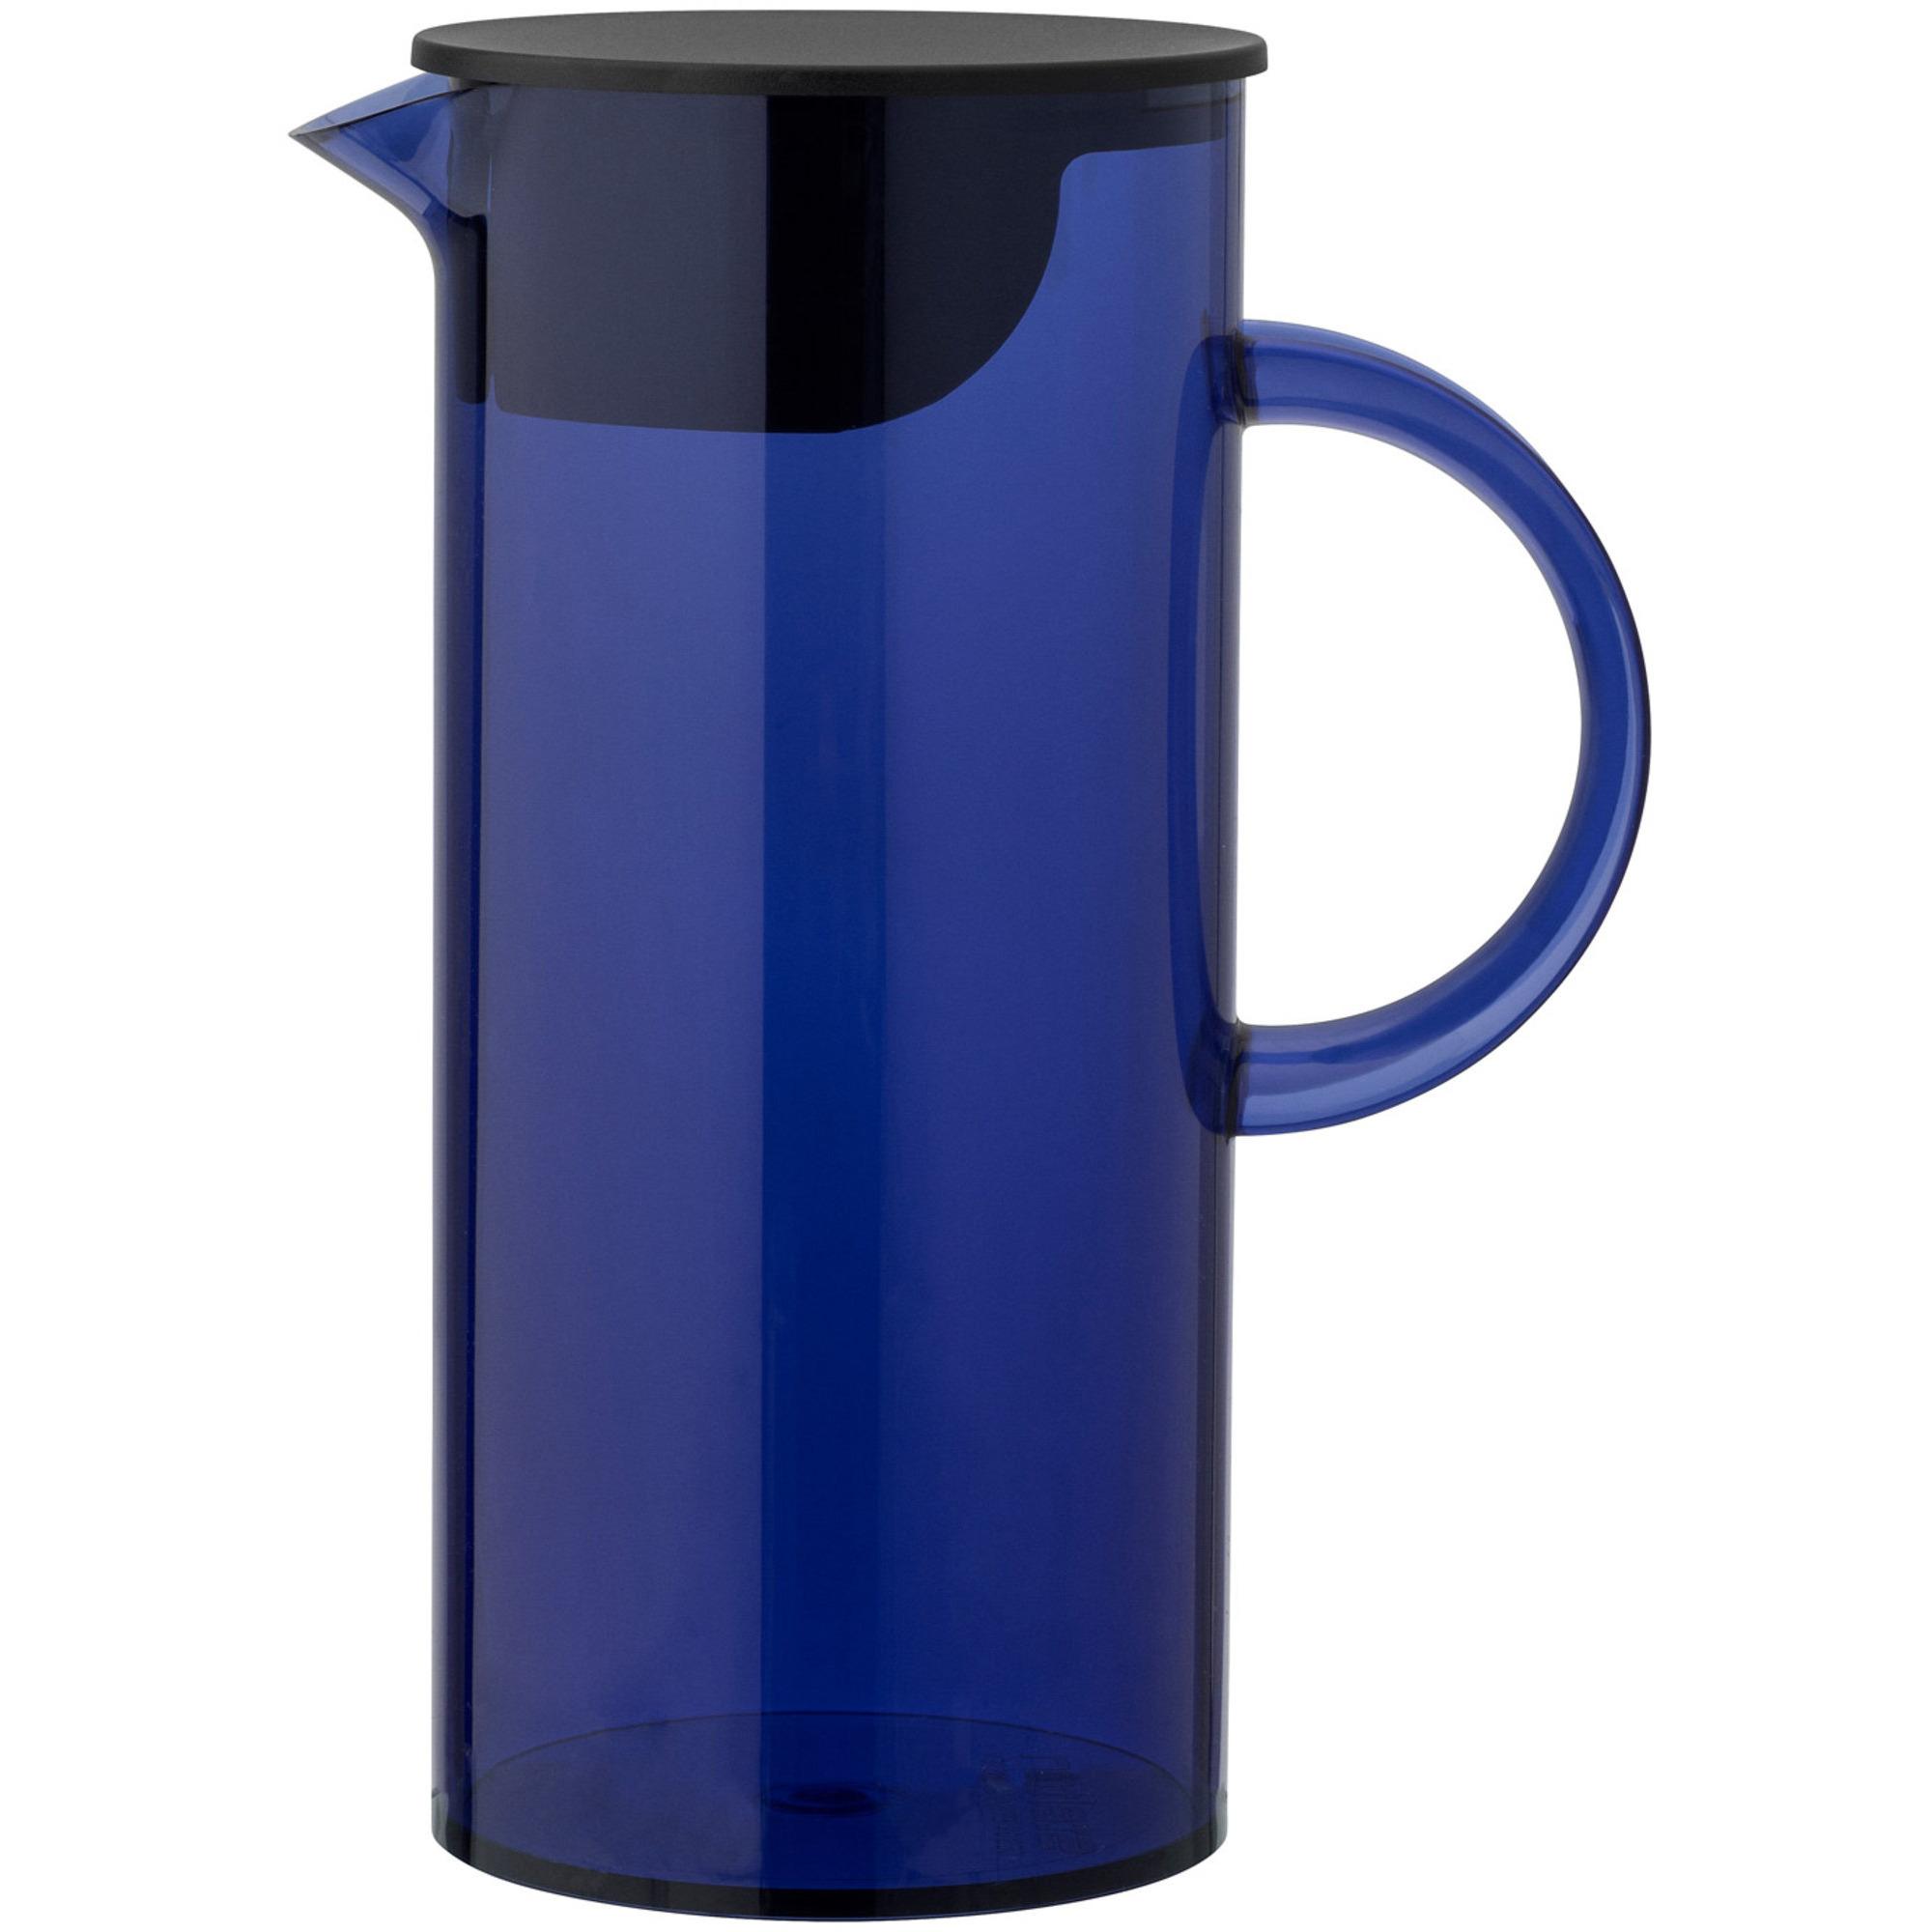 Stelton EM Kanna med lock 15 liter Transparent Ultramarine